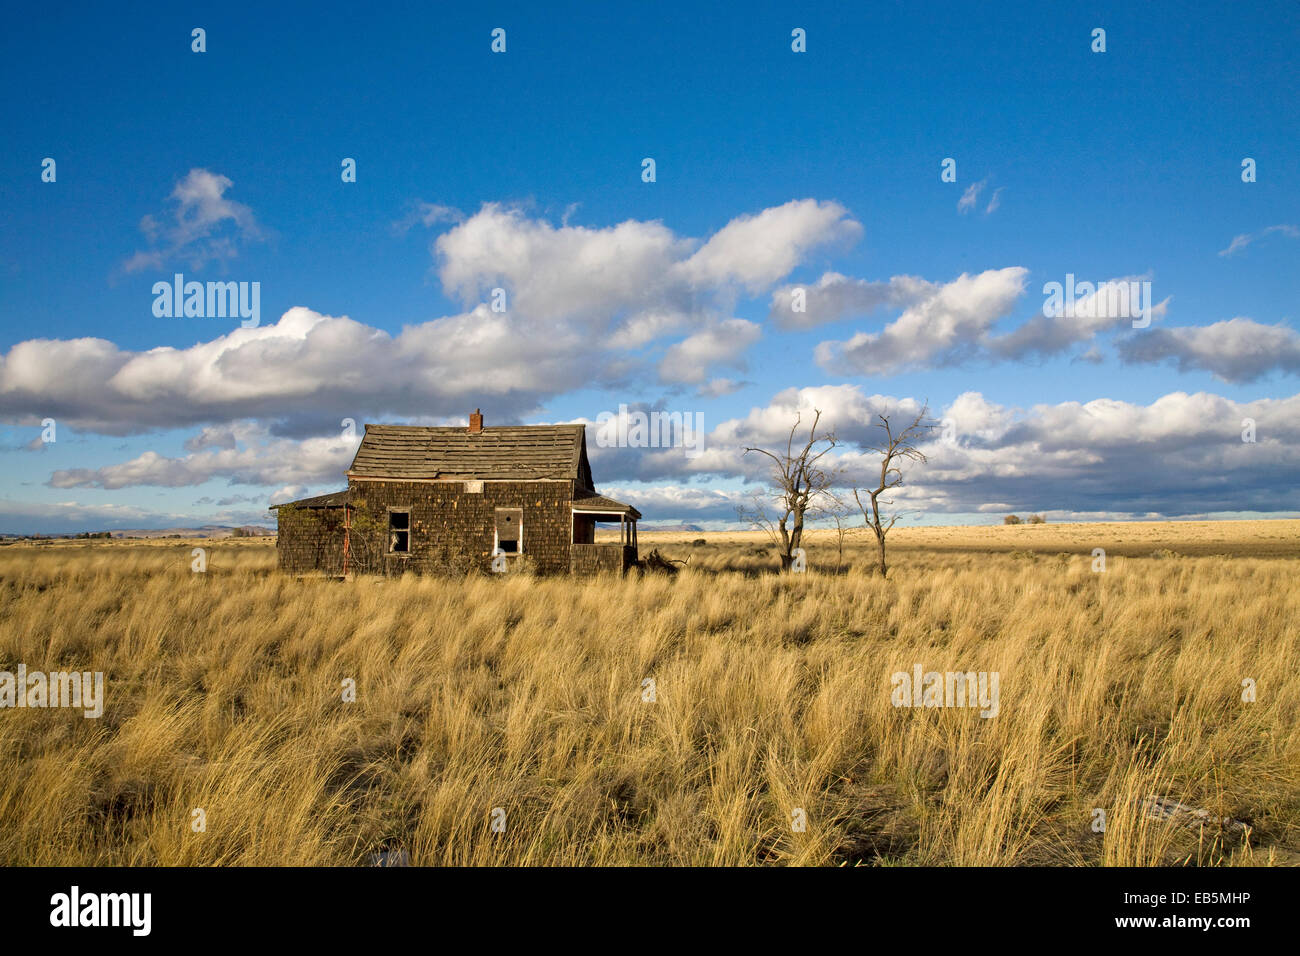 A Depression era farm house in an abandoned wheat field near Madras, Oregon, circa 1920s - Stock Image